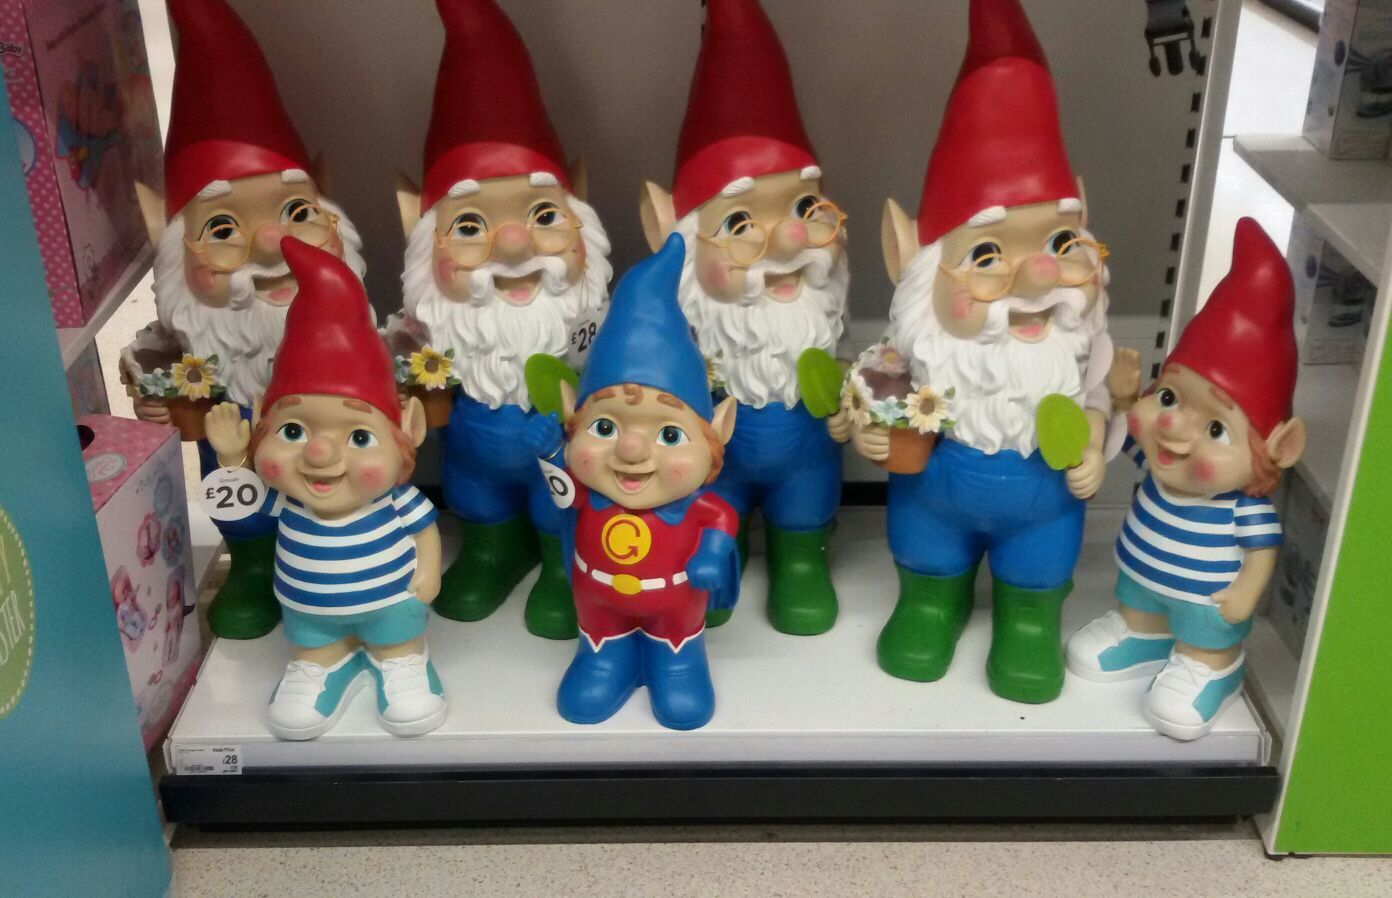 Asda (walmart) Garden Gnomes Asda gnomes, Gnomes, Gnome